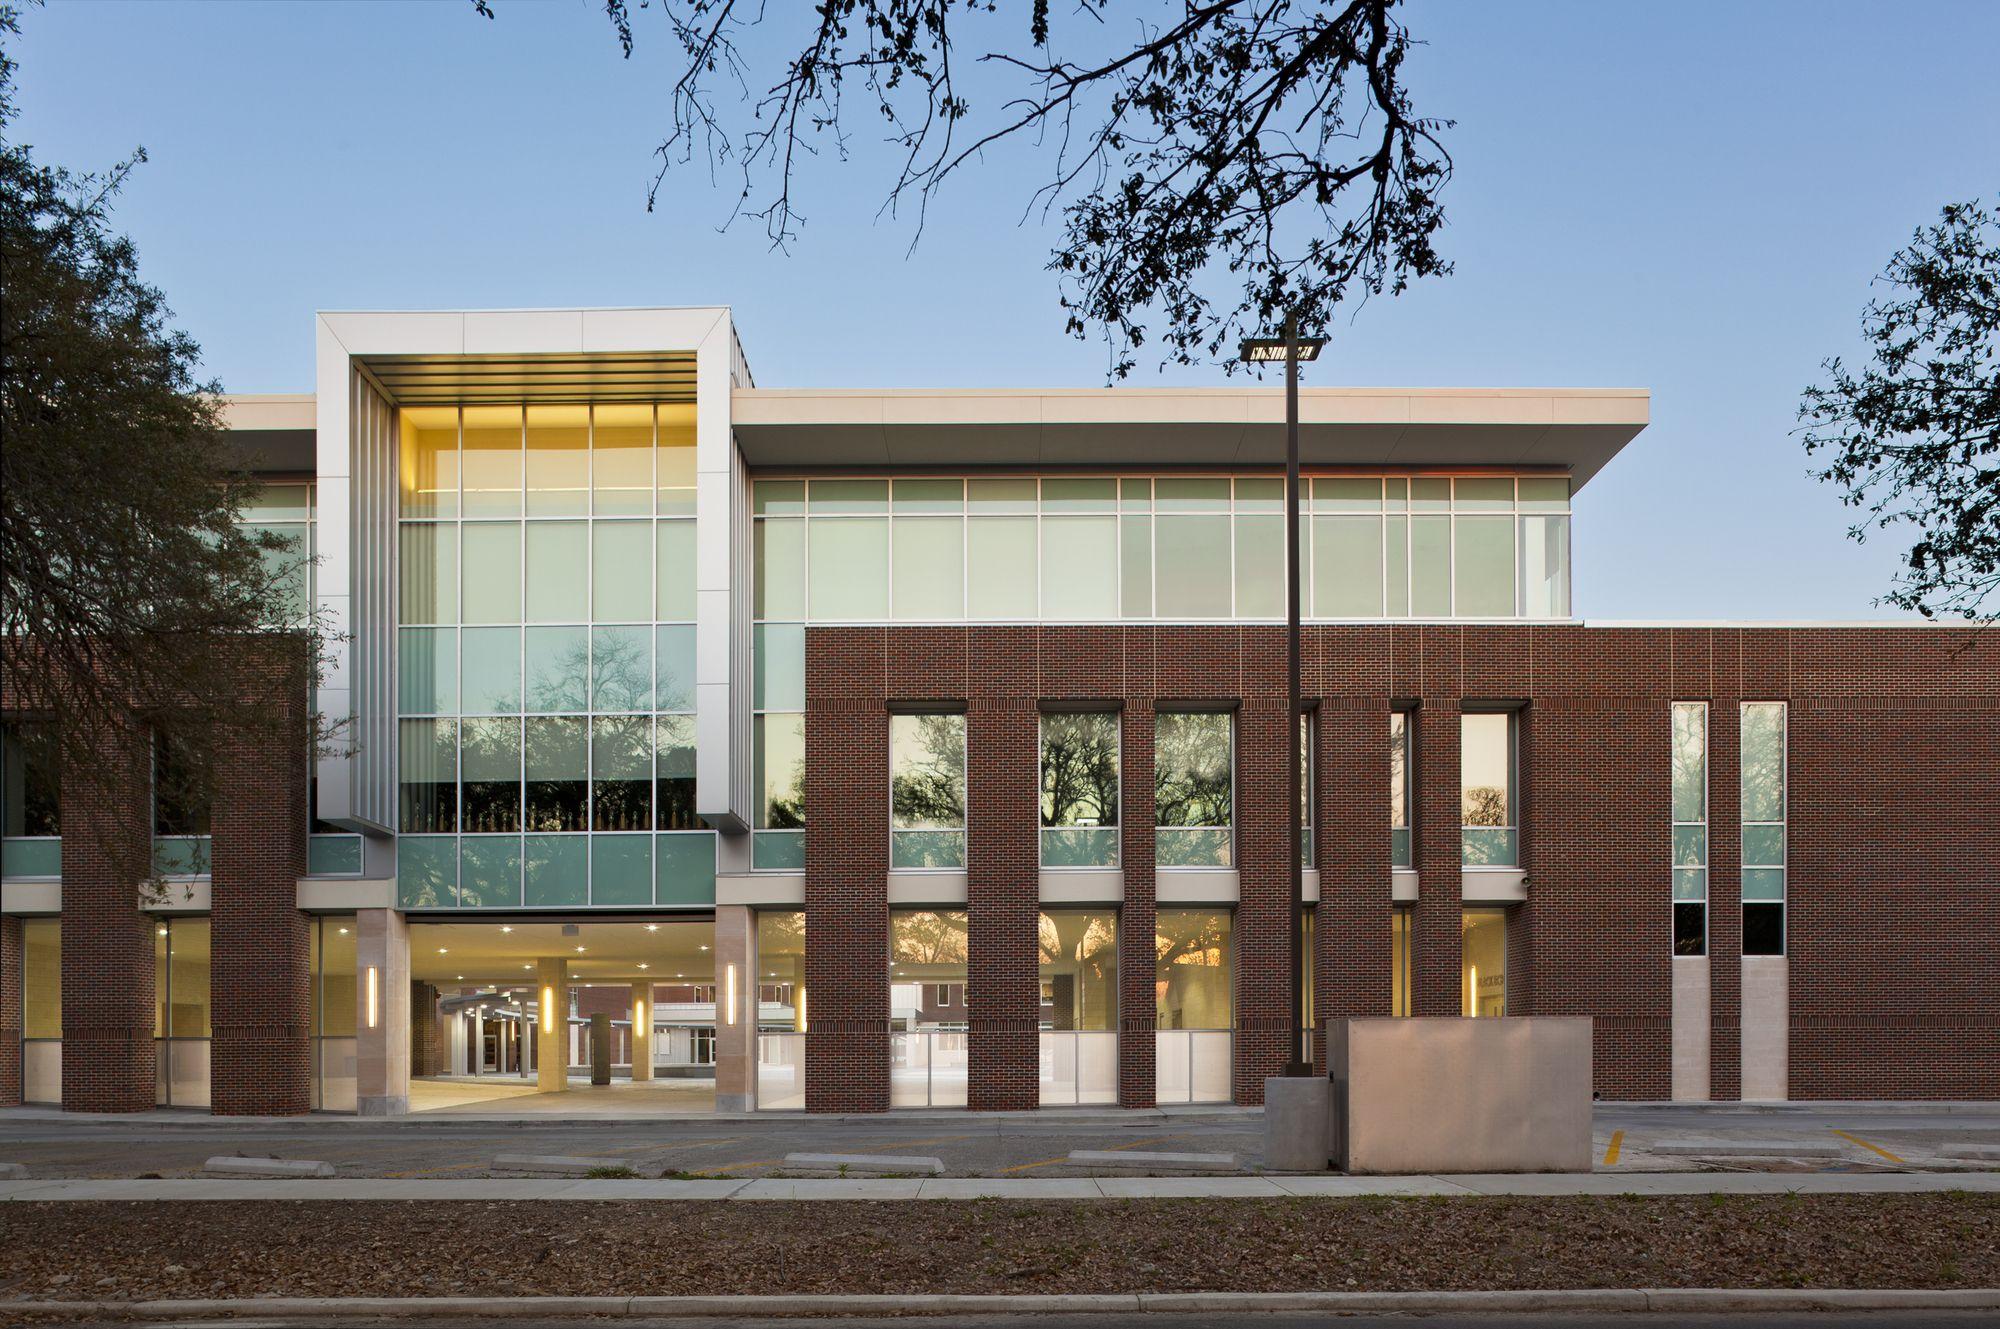 Baton Rouge Magnet High School / Chenevert Architects + Remson|Haley|Herpin Architects